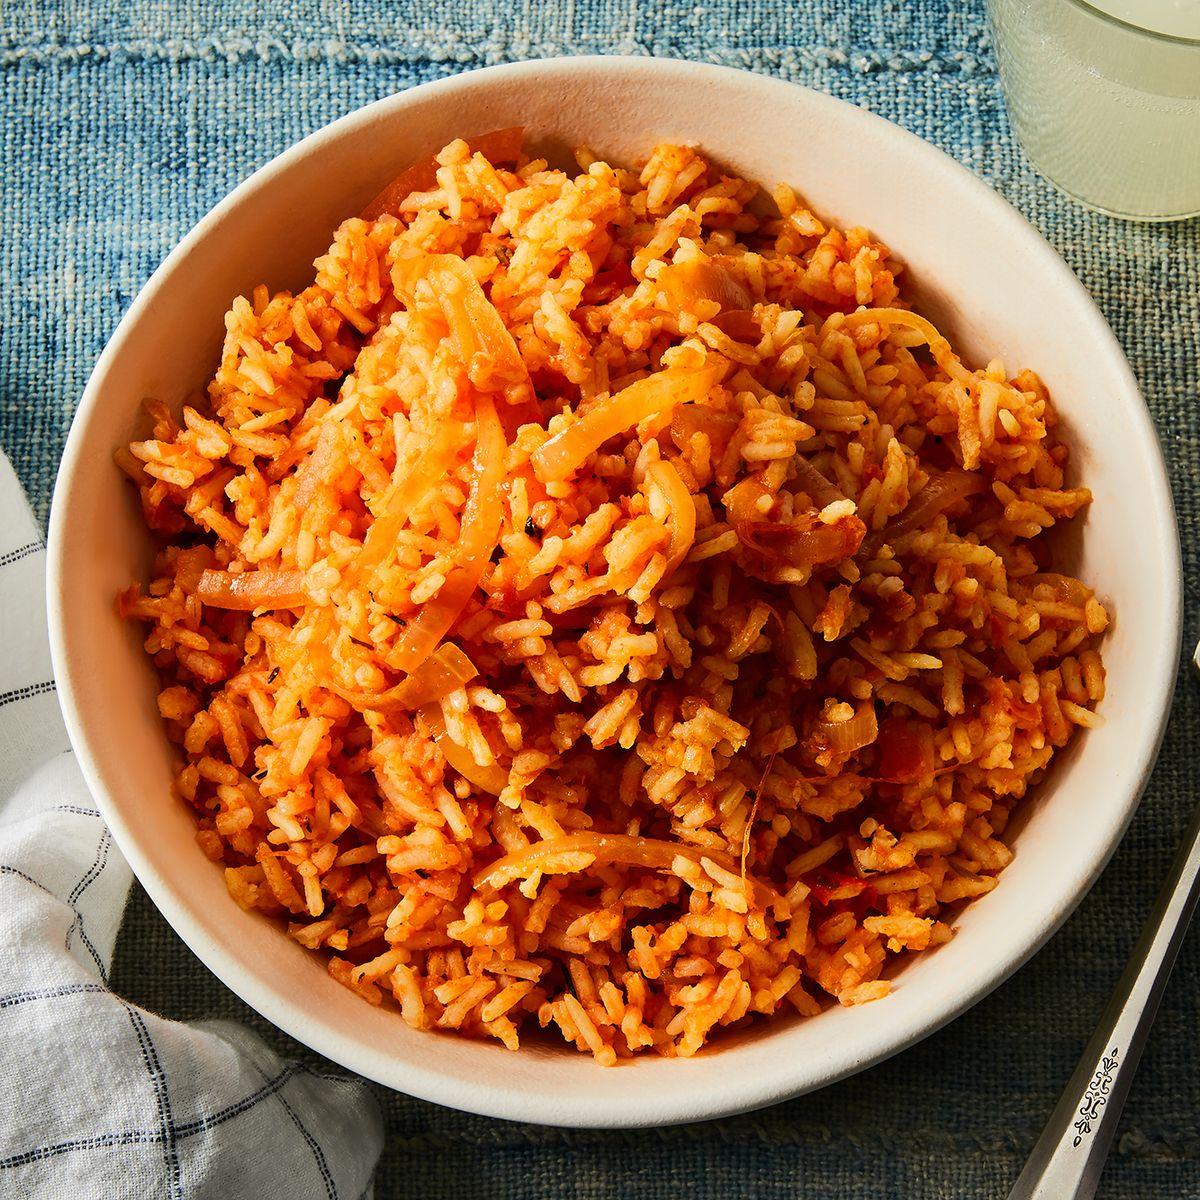 583d2633 65c0 43d6 9b52 cba0c8fa1399 2019 1210 nigerian jollof rice 3x2 rocky luten 006